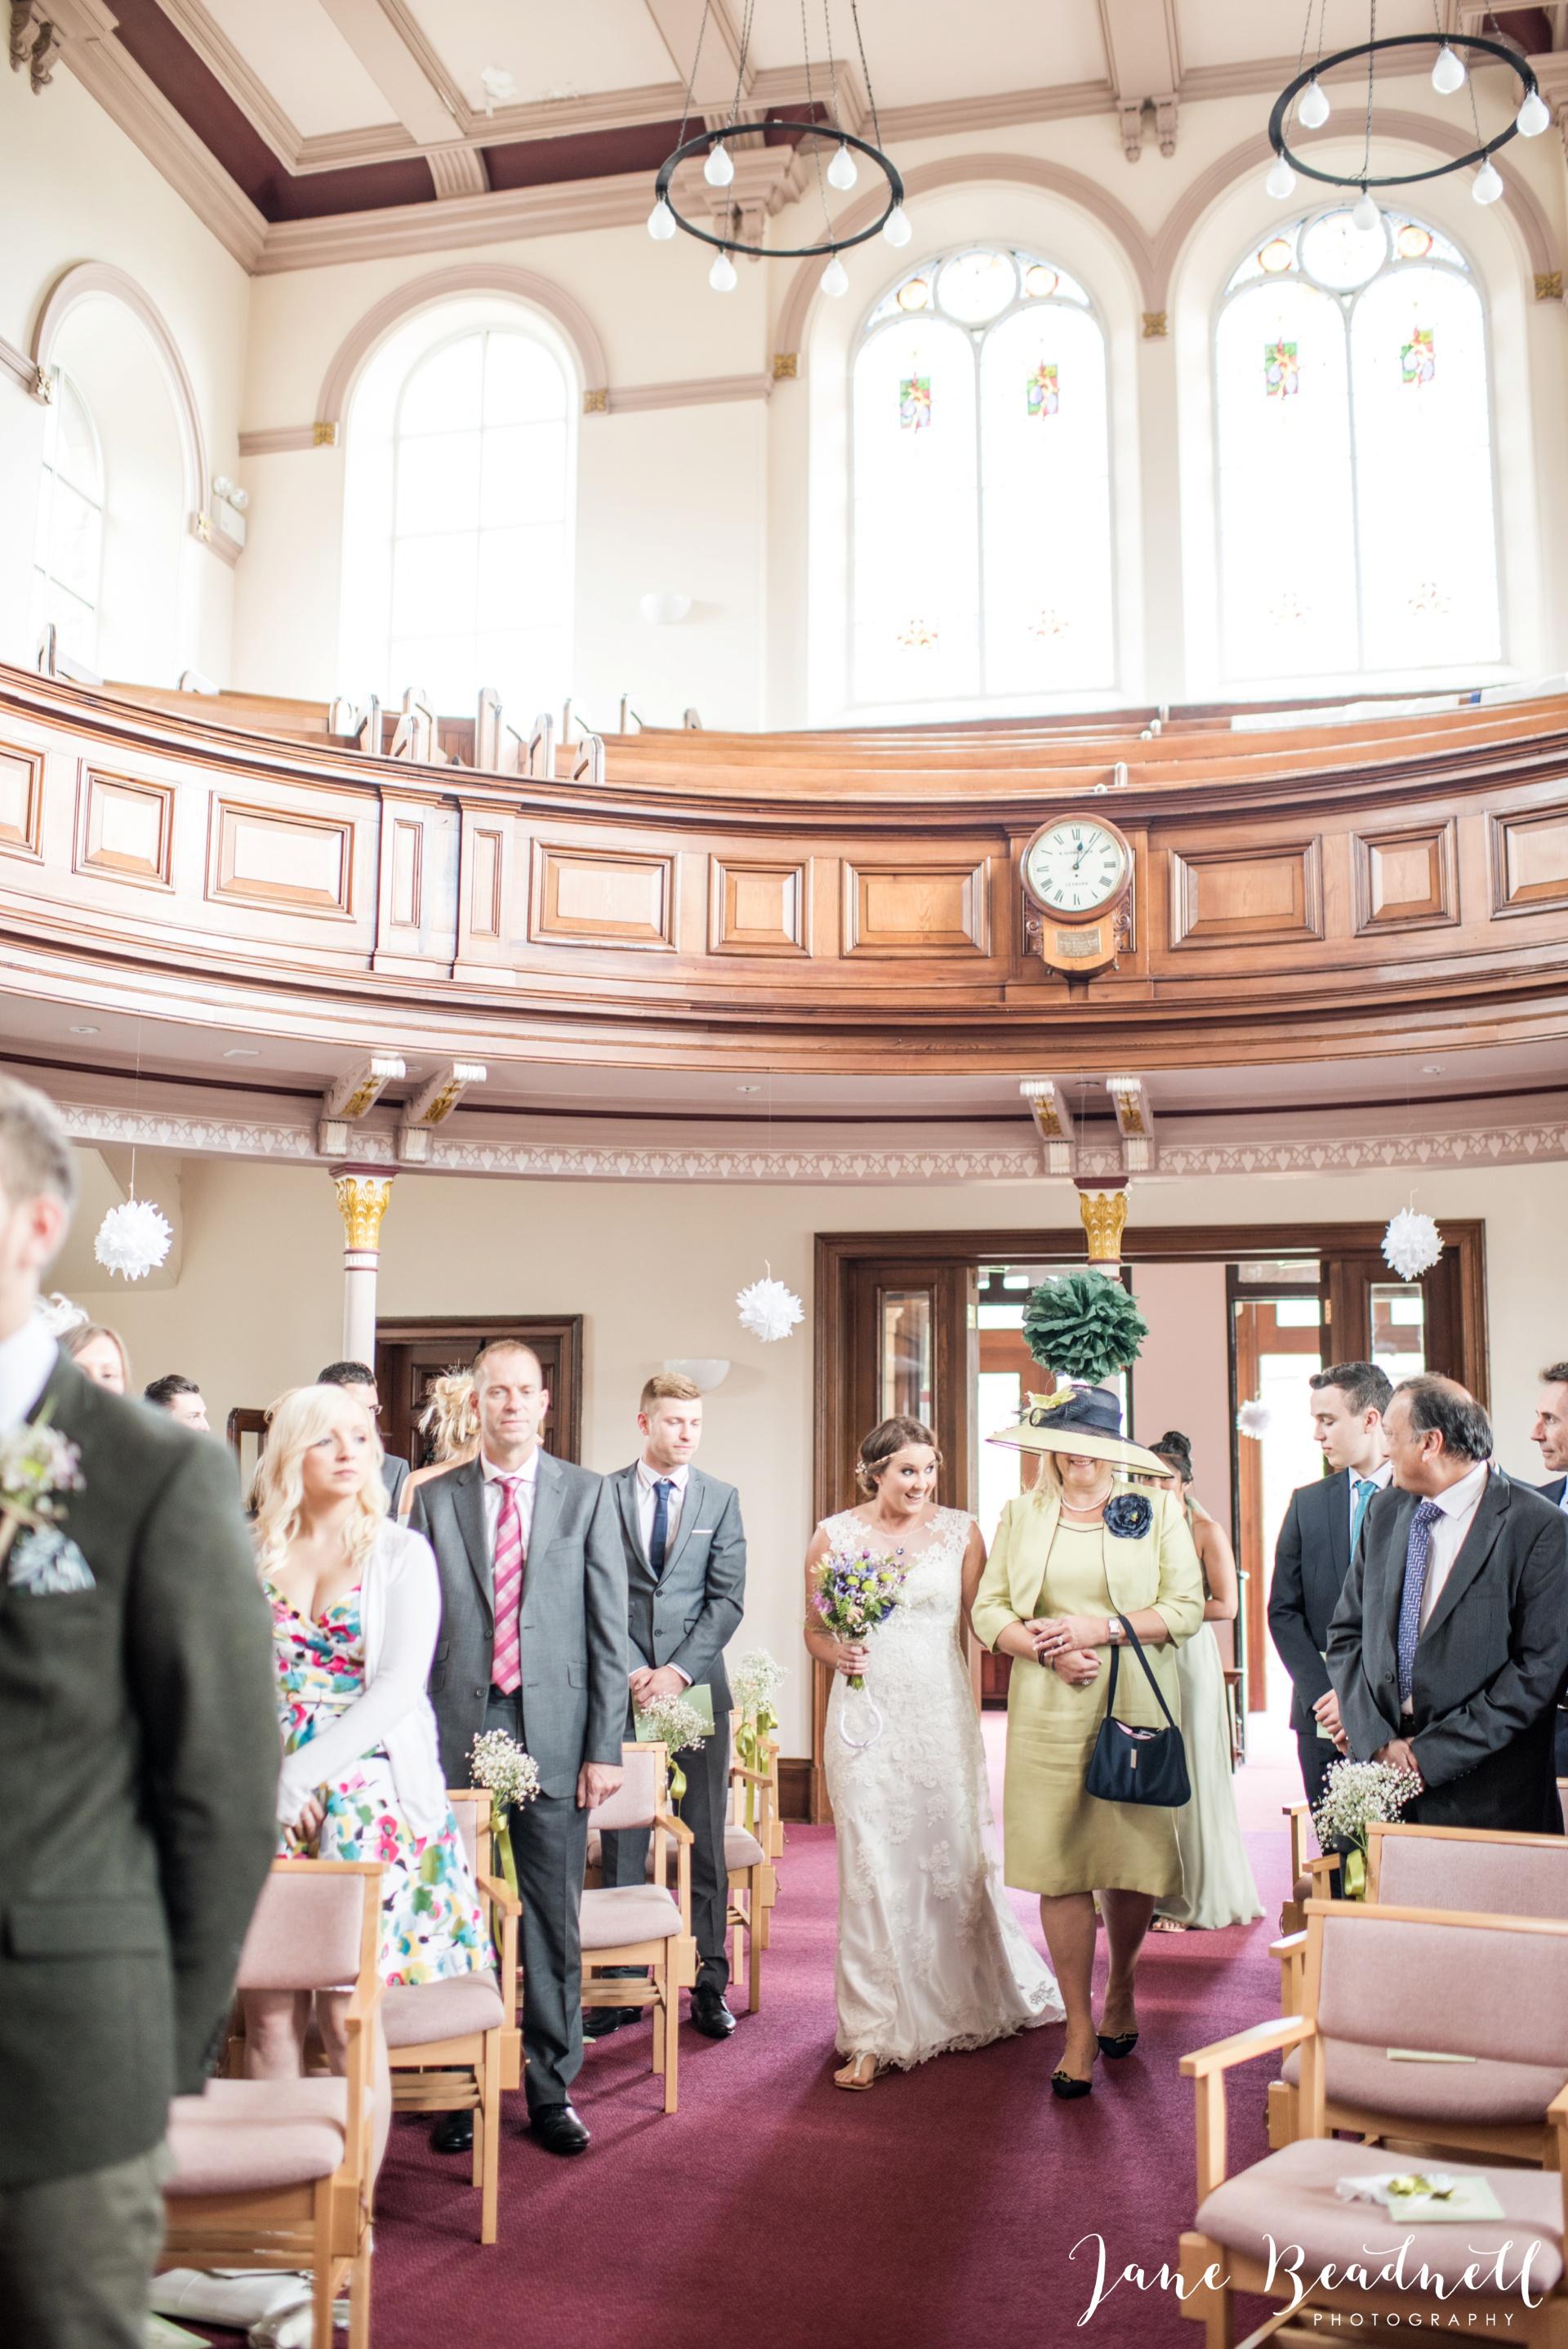 Jane Beadnell fine art wedding photographer The Old Deanery Ripon_0024